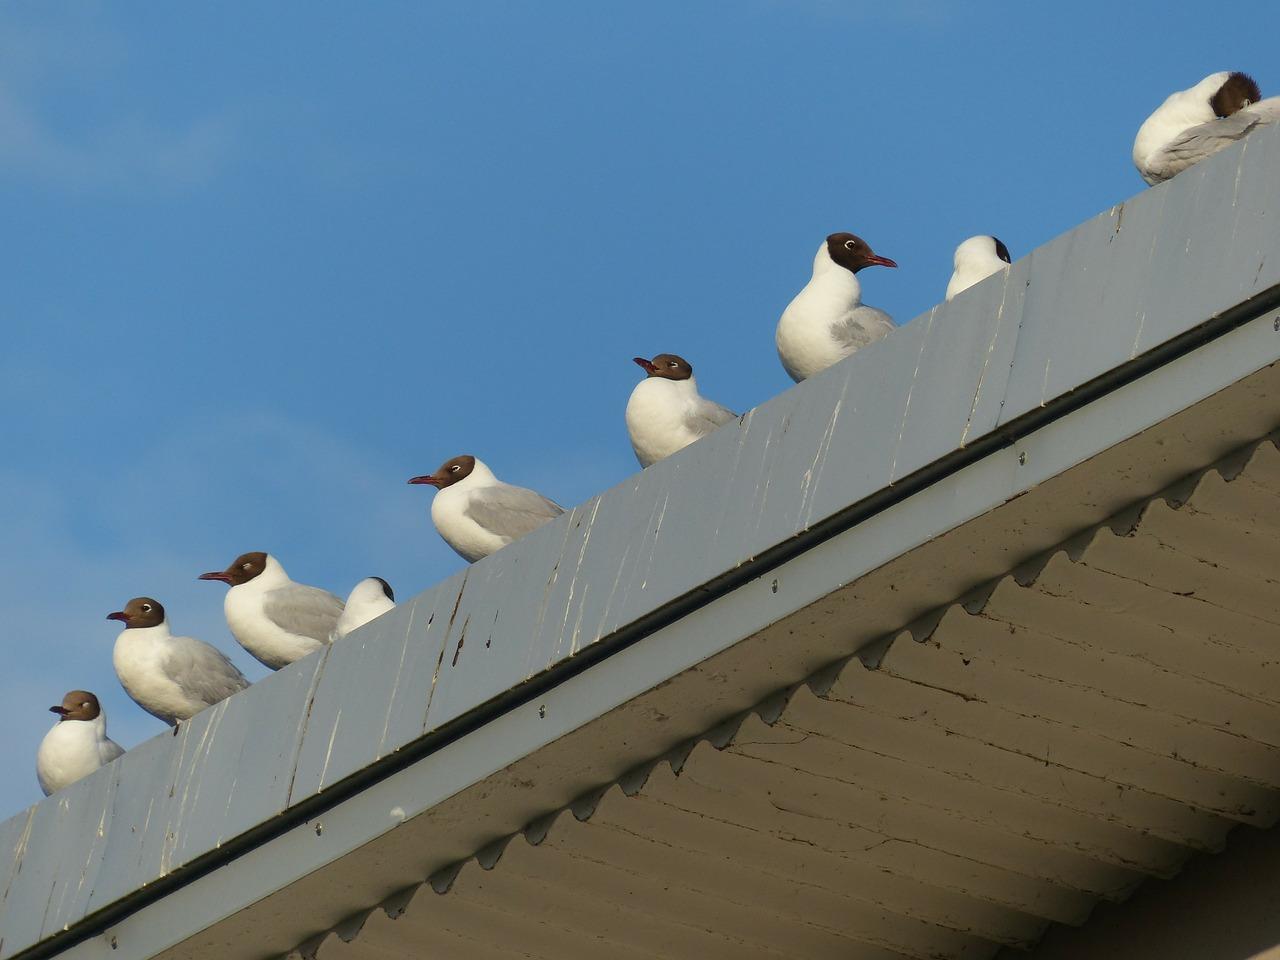 seagulls waiting